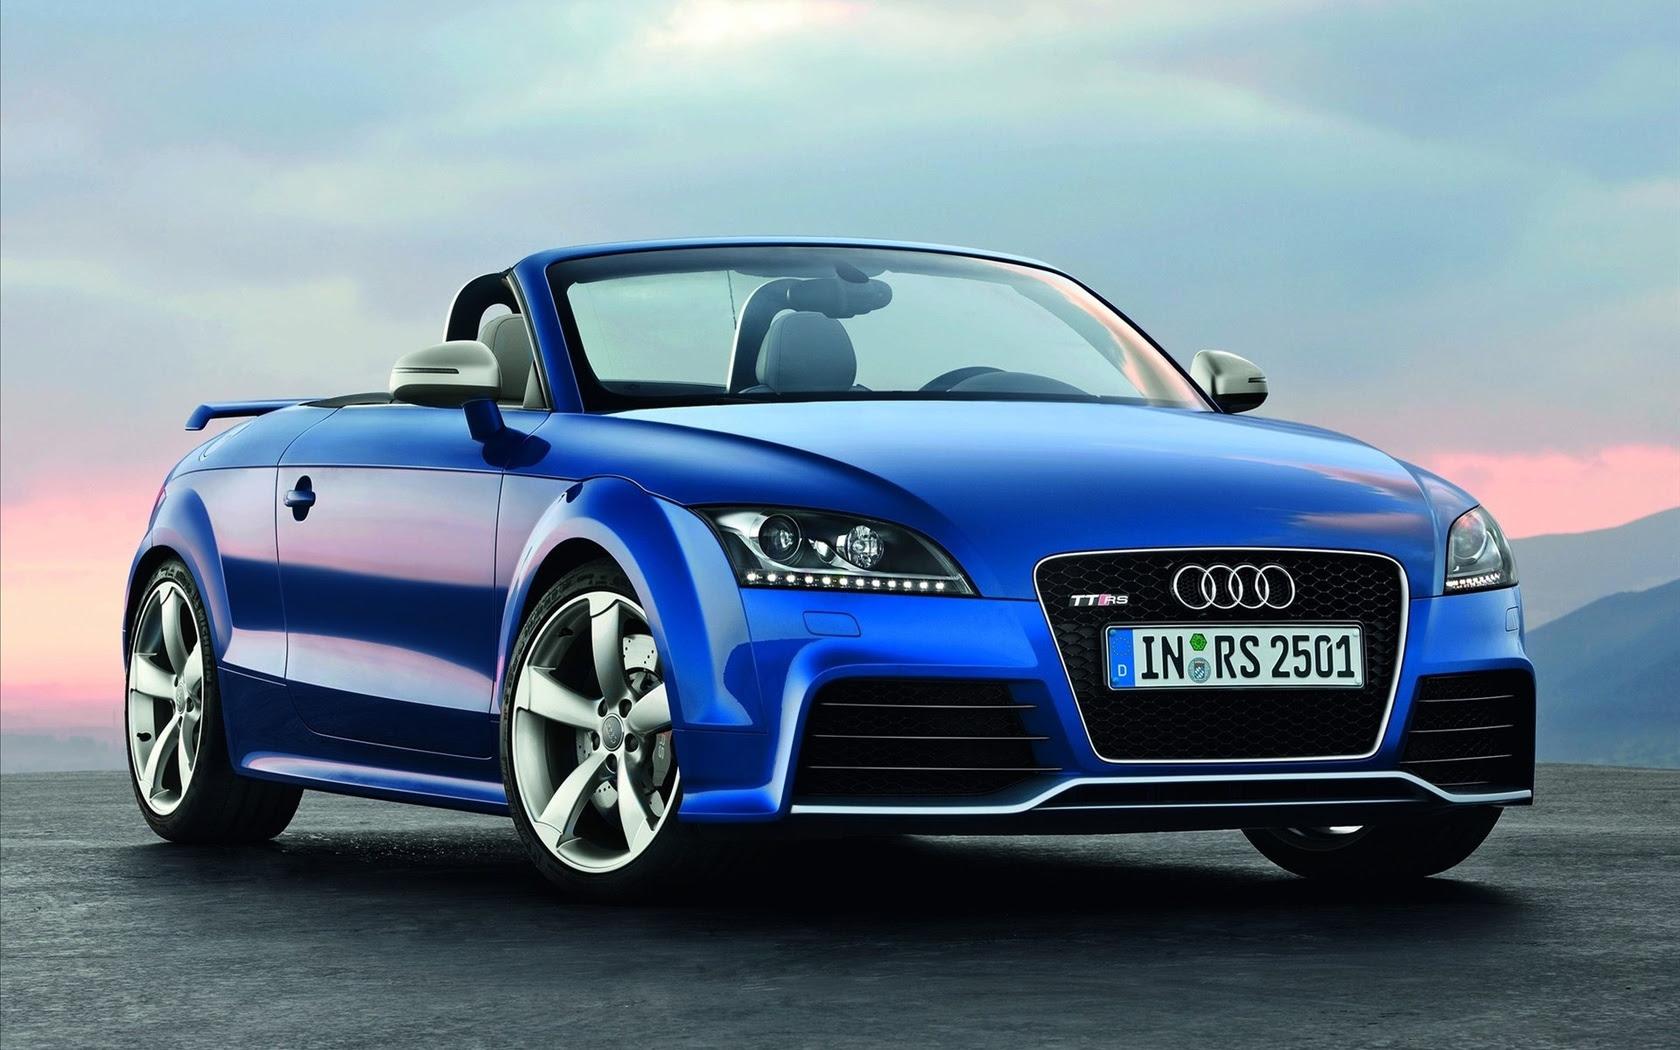 Blue Car Backgrounds, Great Blue Car, 1680x1050, #12833